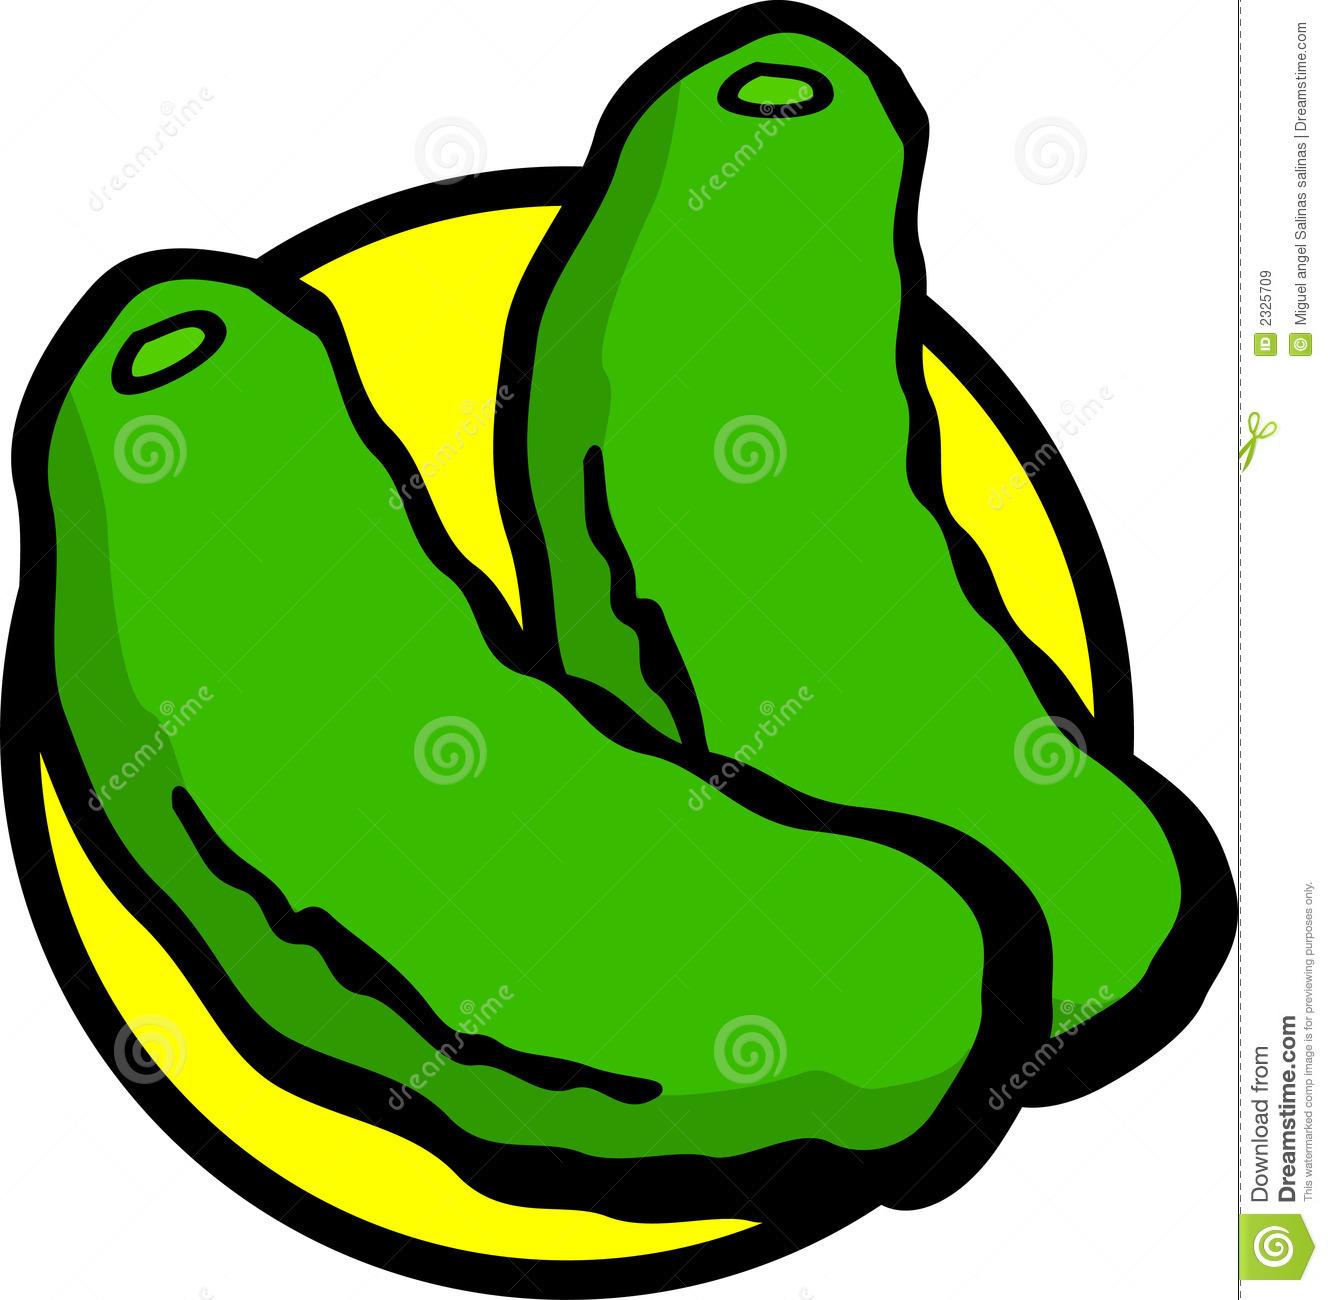 Cartoon pickles clipart.